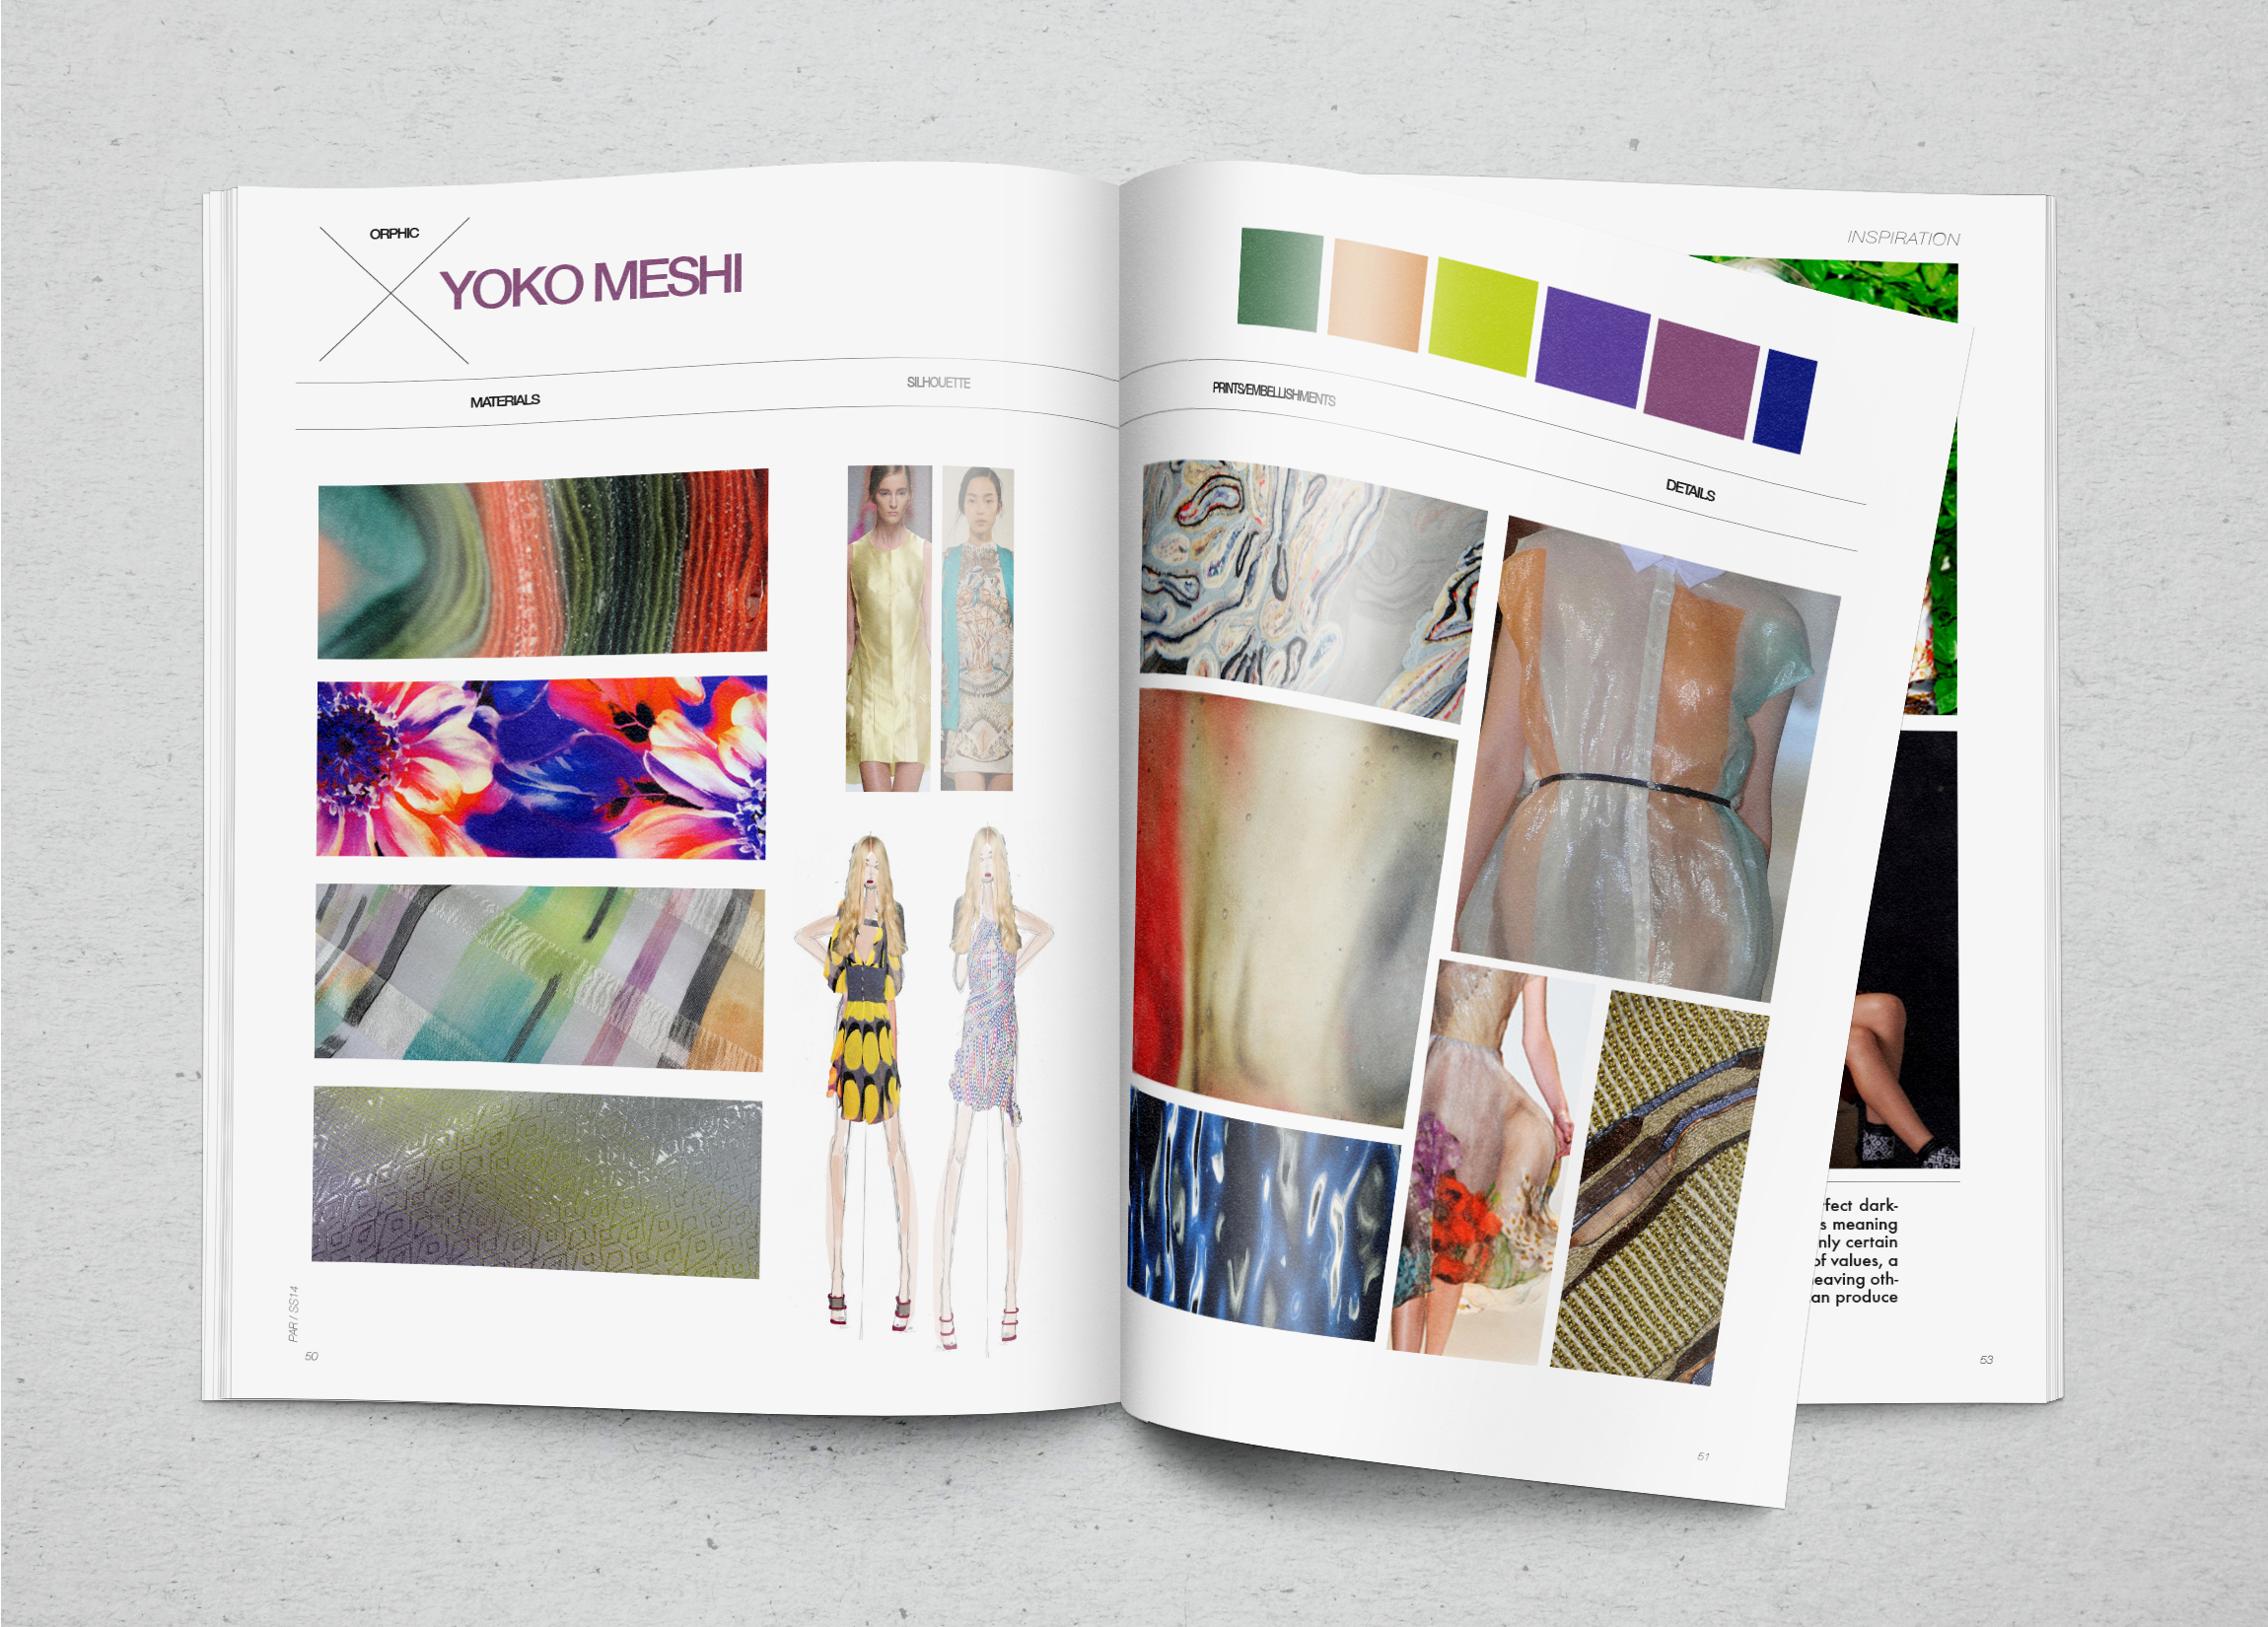 PARd_4Photorealistic Magazine MockUp.jpg